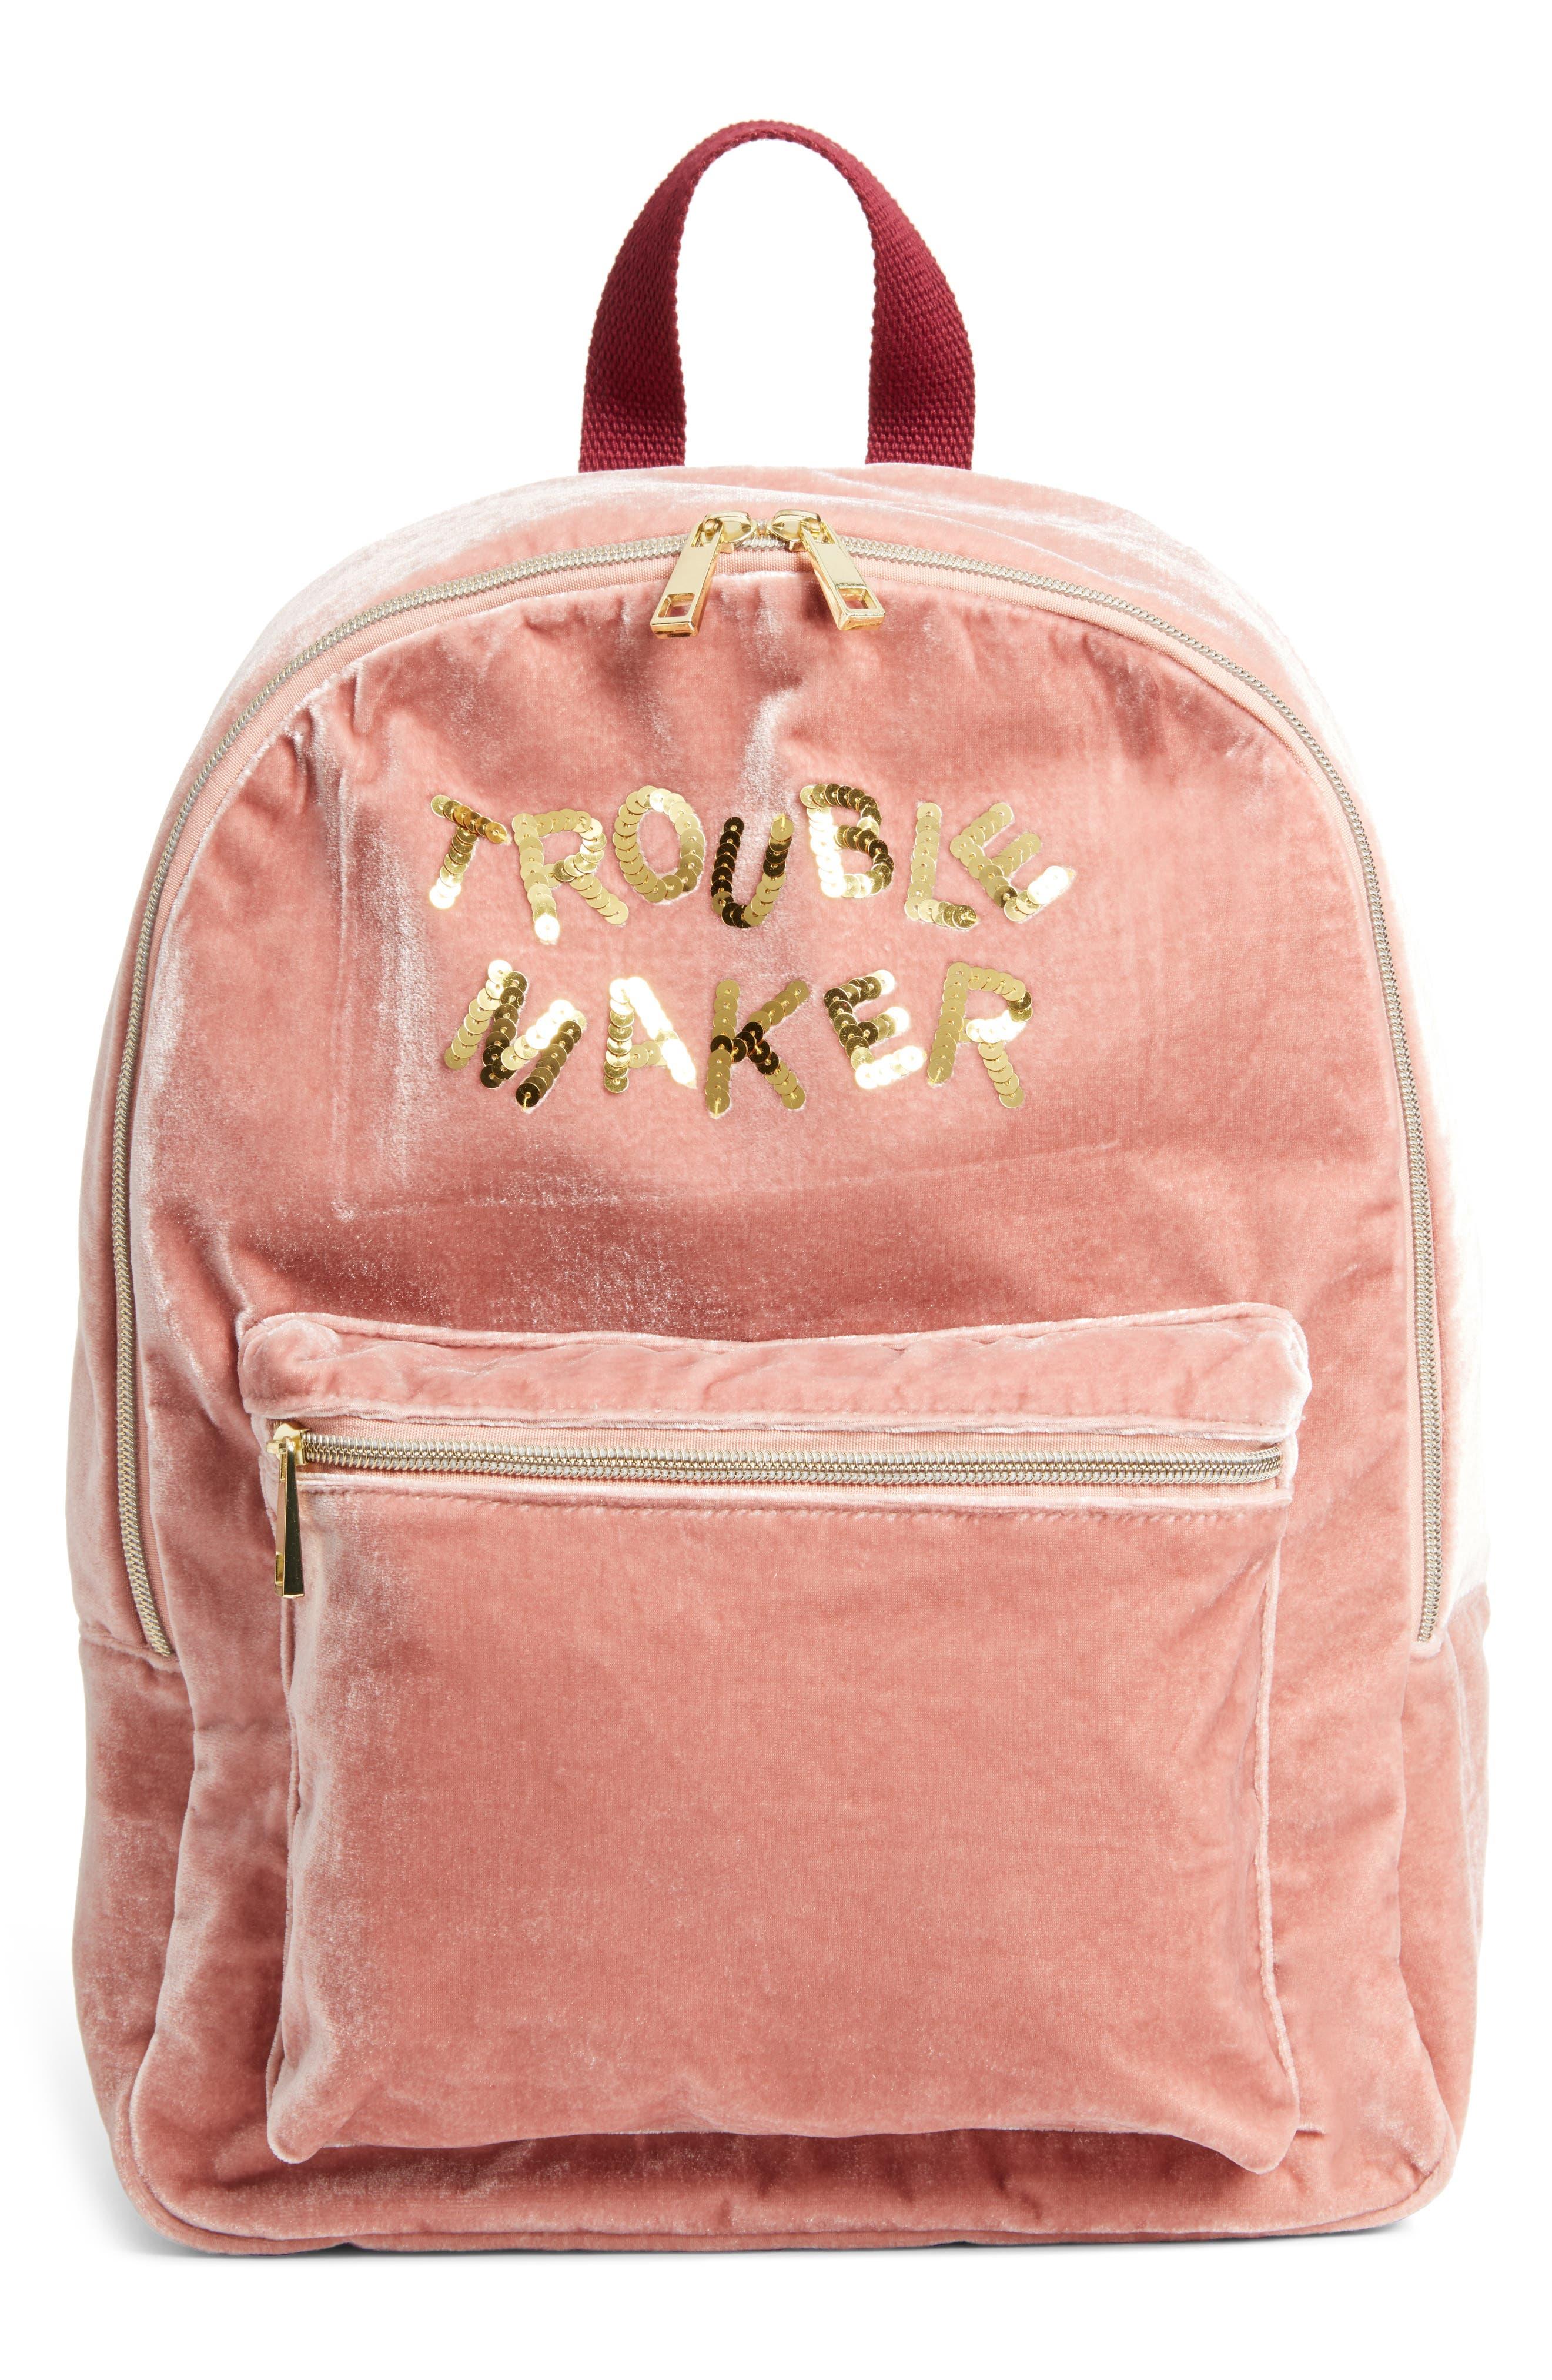 Trouble Maker Backpack,                             Main thumbnail 1, color,                             Blush